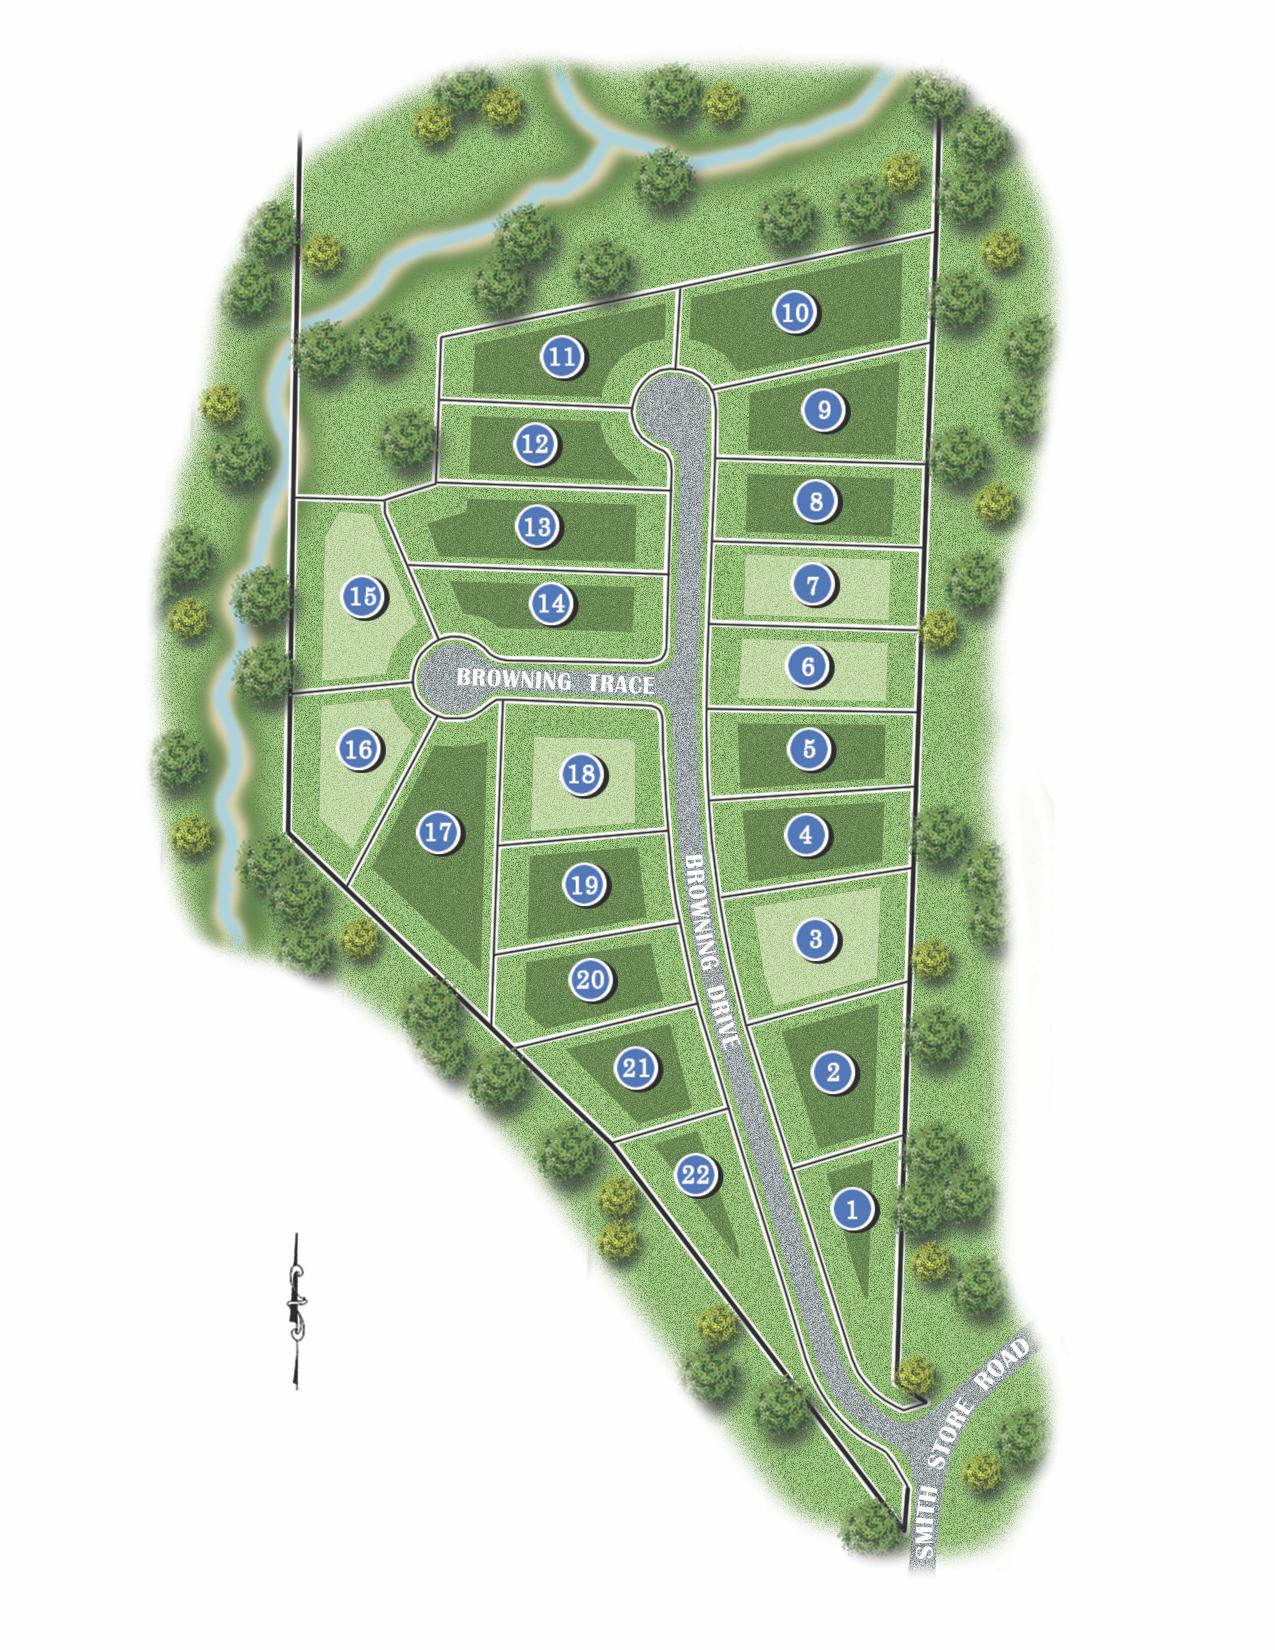 Covington, GA Browning Estates New Homes from Liberty Communities